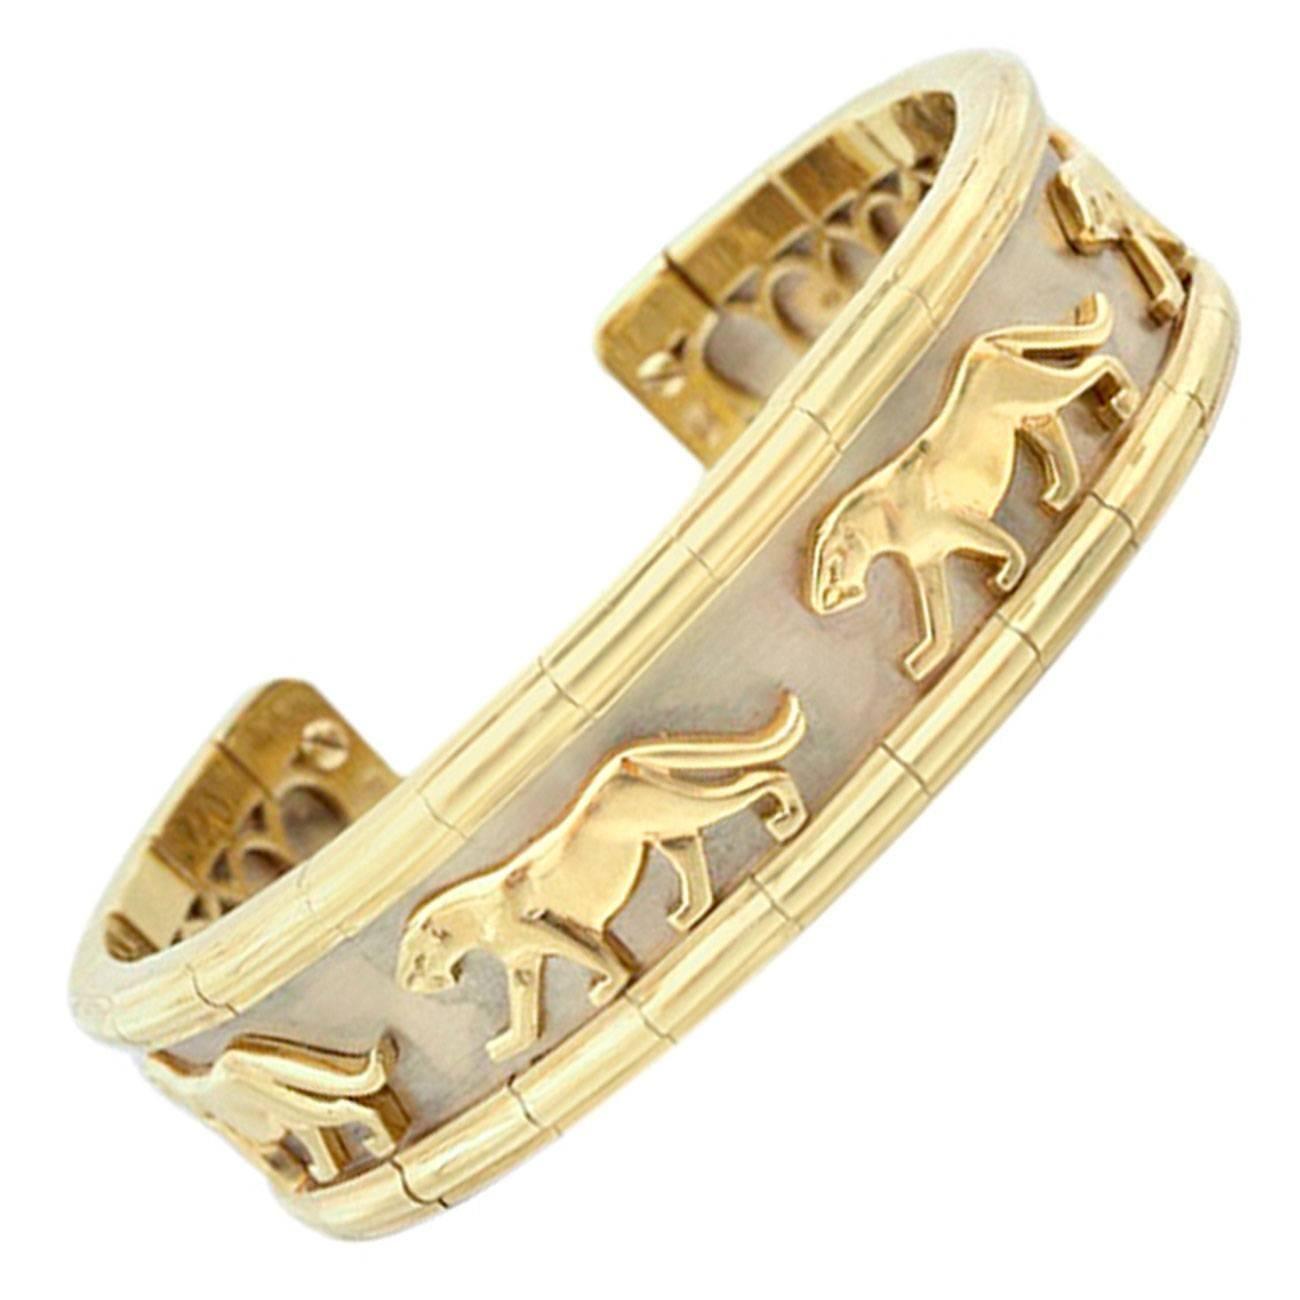 Cetas Gold Panther Cuff Bracelet